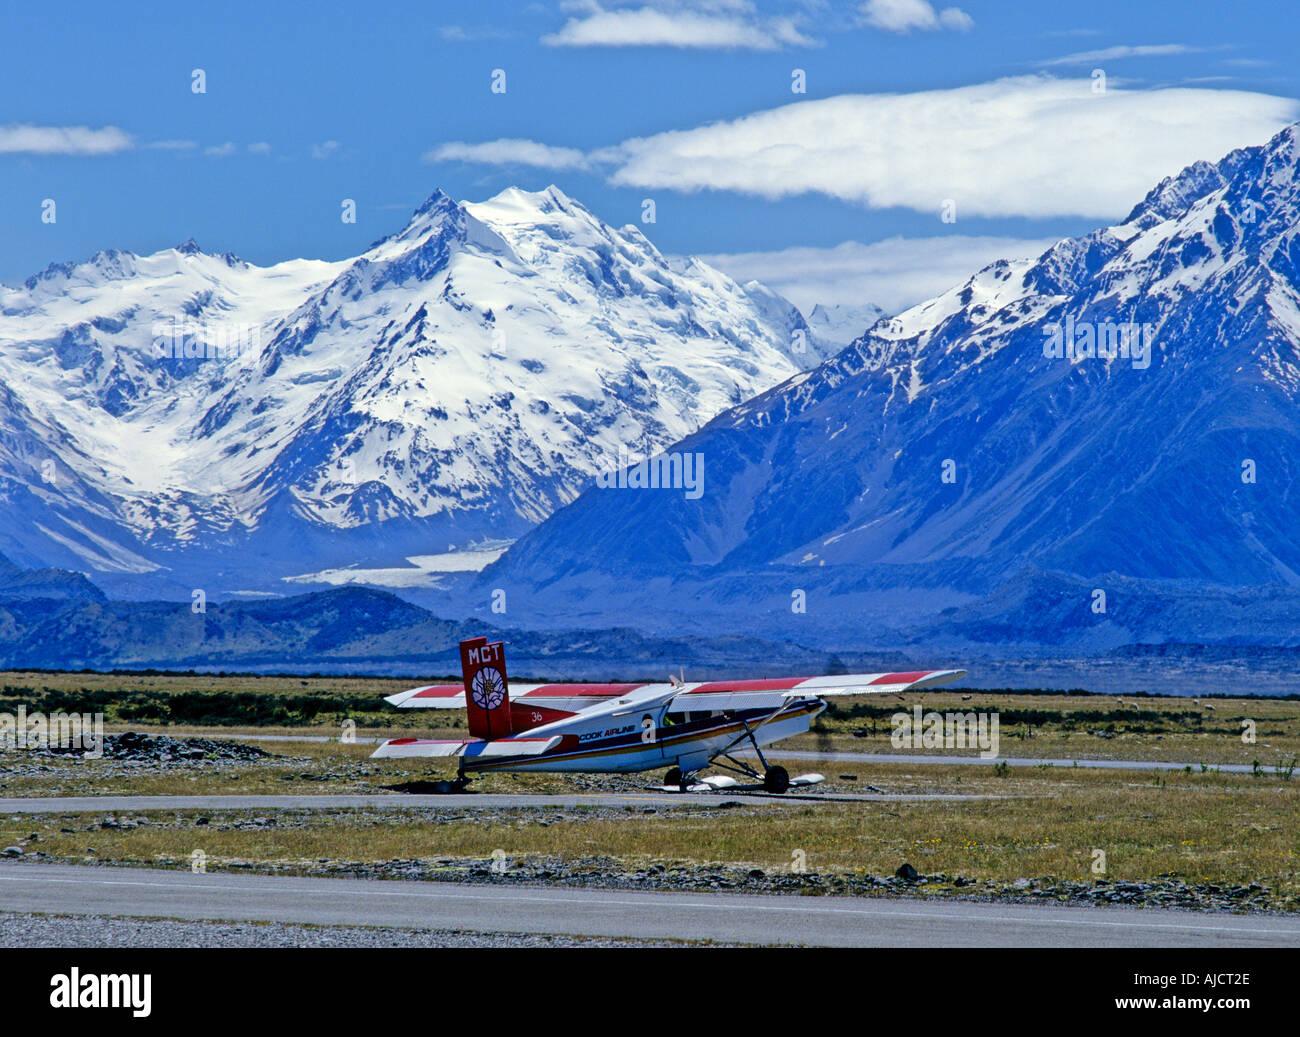 Mount Cook Airline Pilatus PC-6 Turbo Porter ski plane in Mt Cook Airport  New Zealand - Stock Image